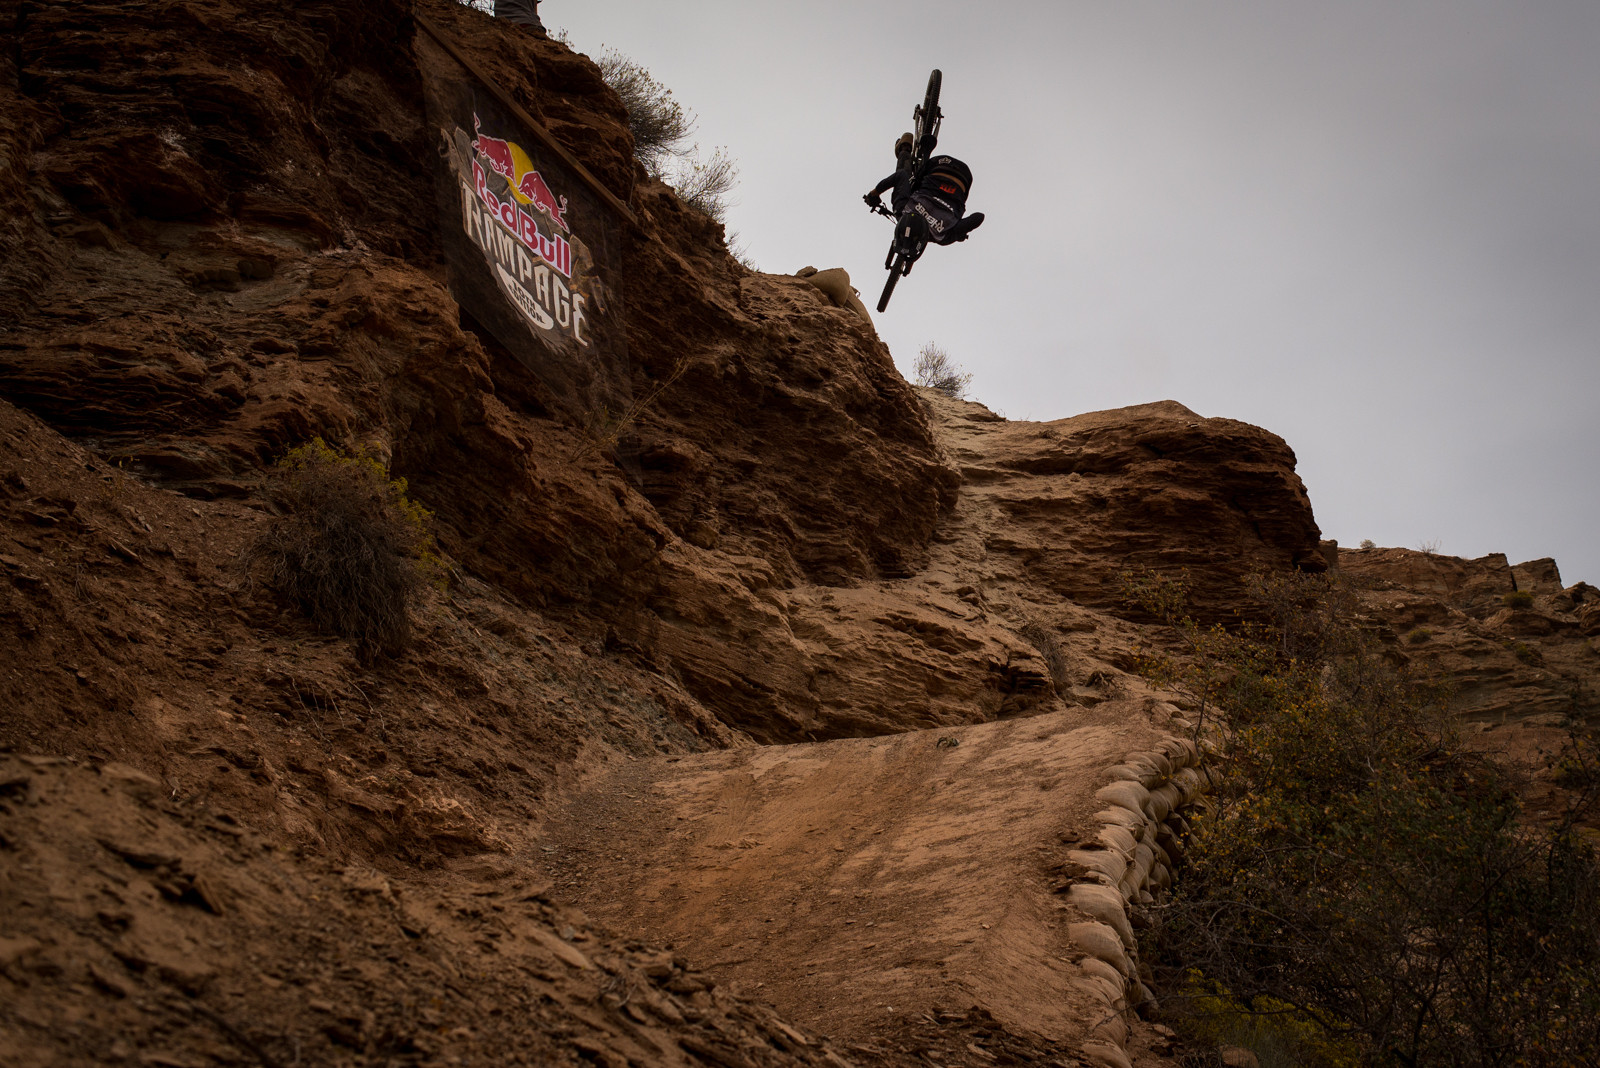 Brett Rheeder - 2015 Red Bull Rampage Finals - Mountain Biking Pictures - Vital MTB